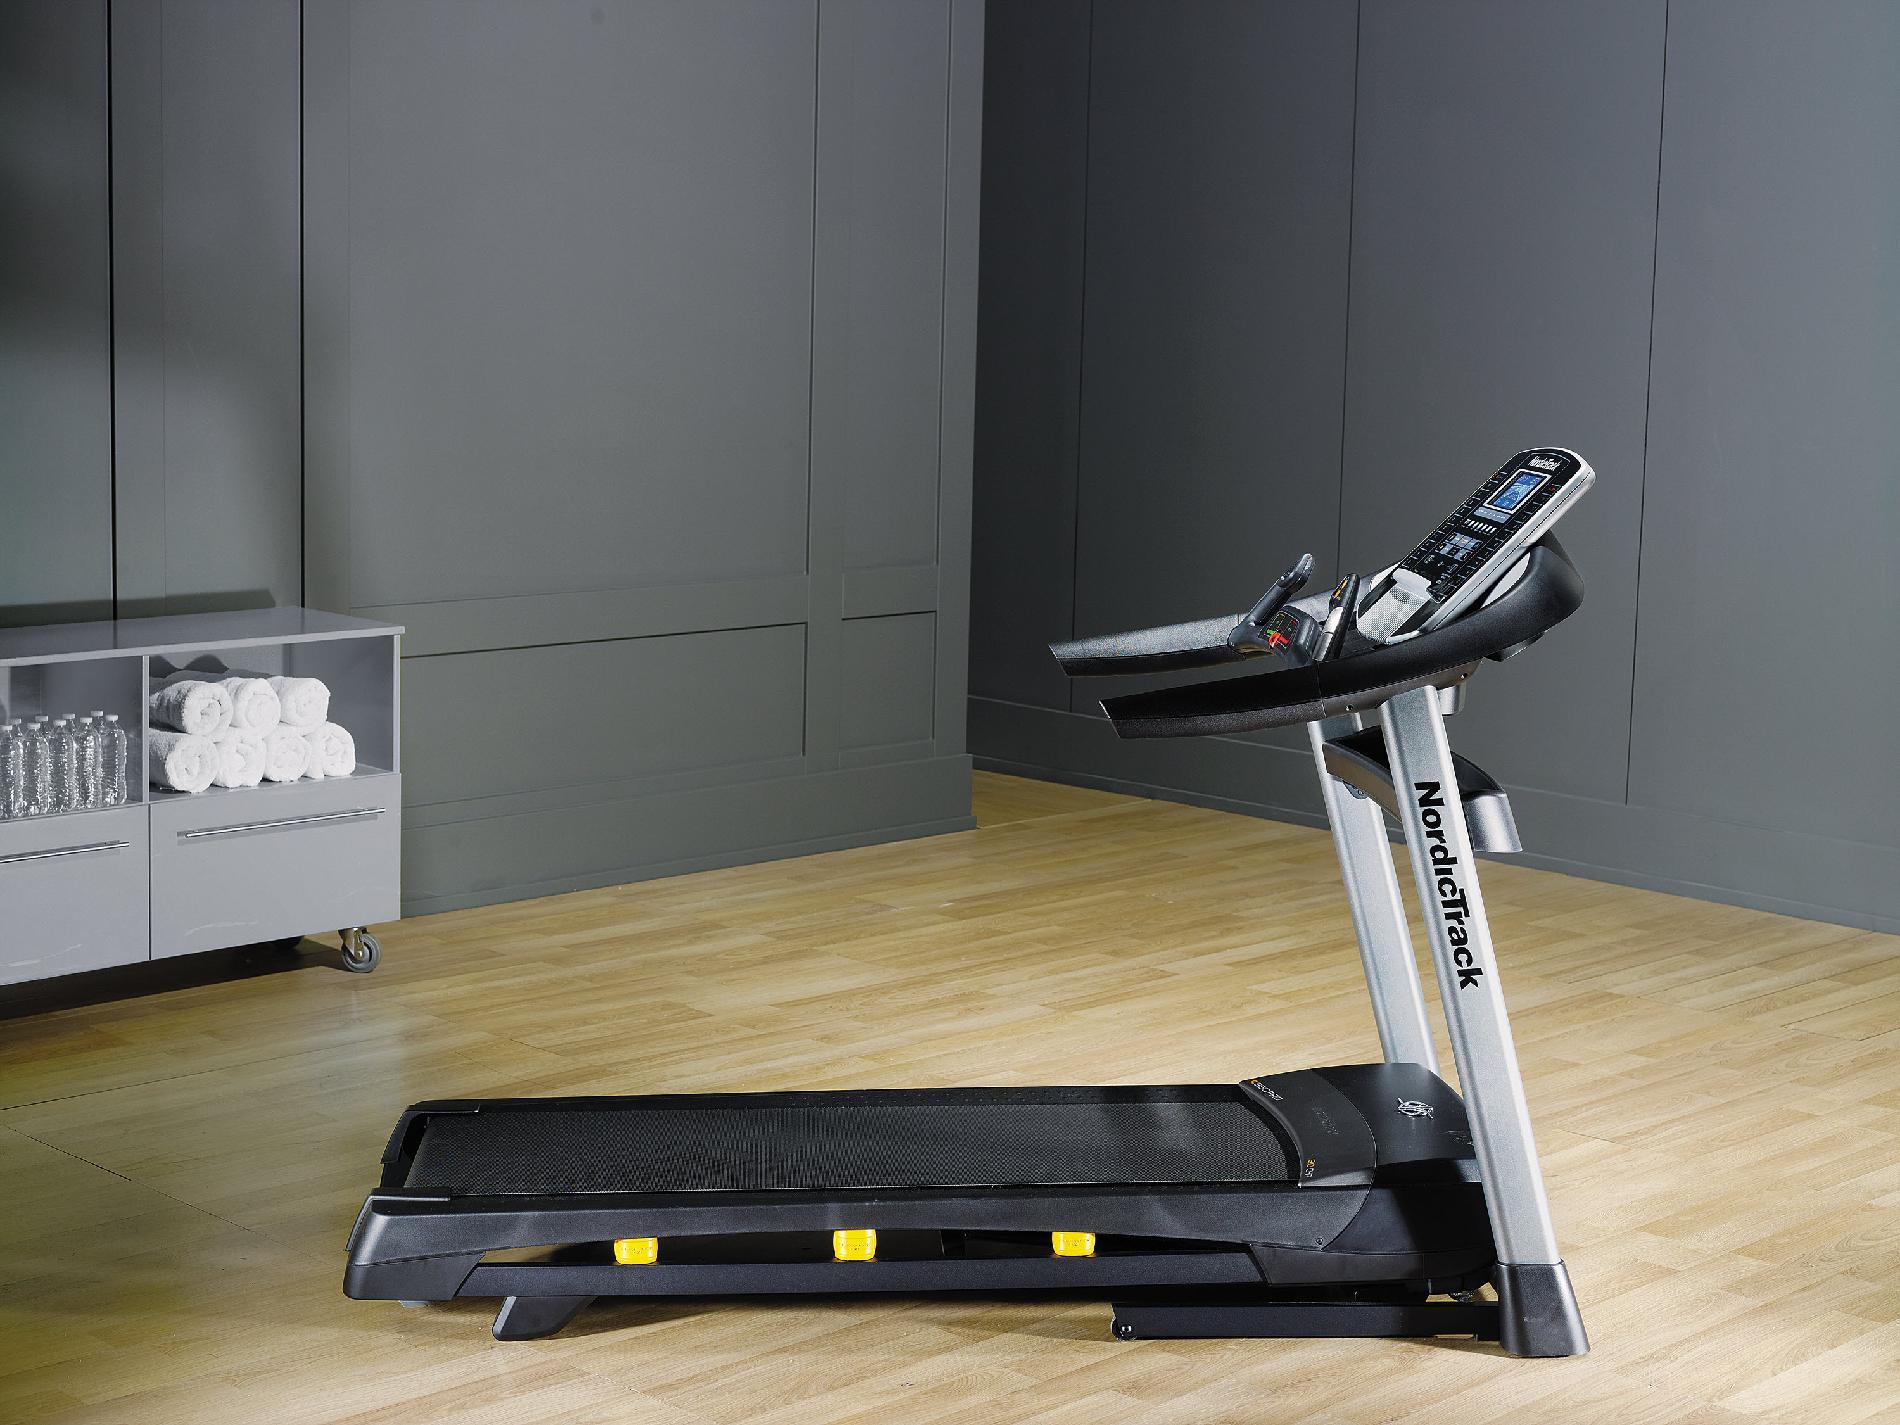 NordicTrack C 950 Pro Treadmill